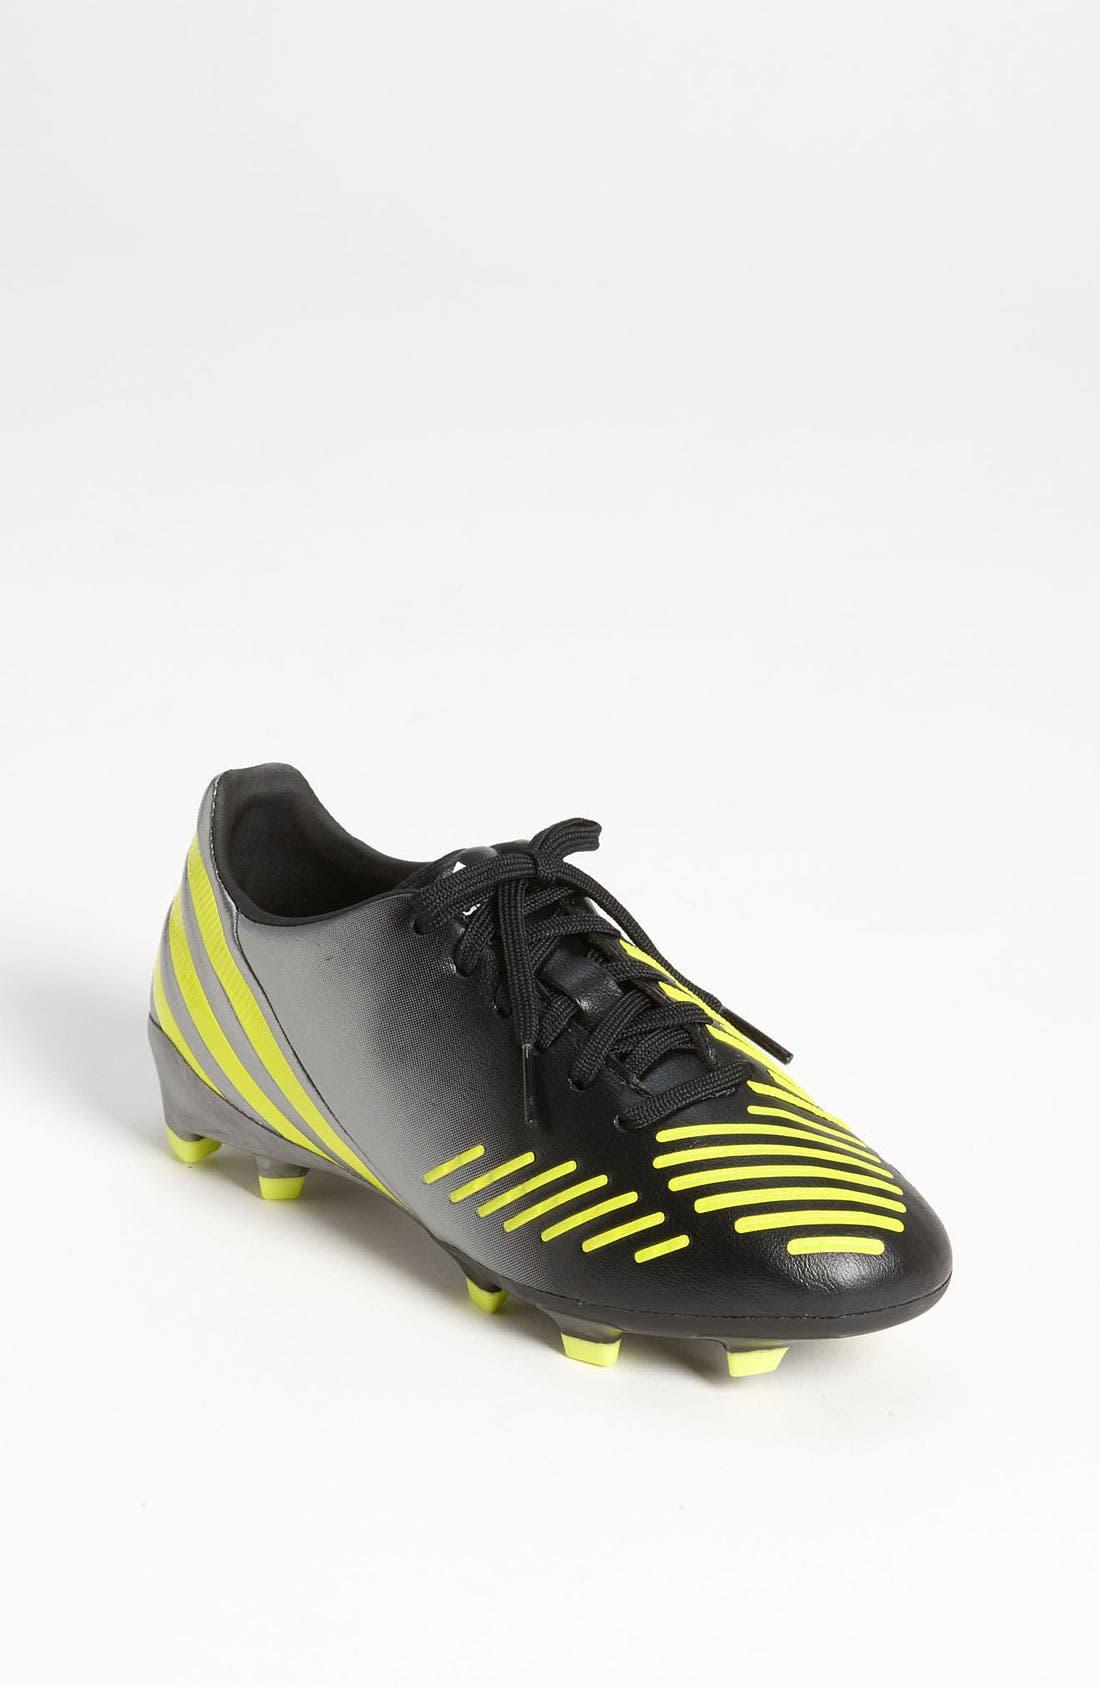 Alternate Image 1 Selected - adidas 'Predator Absolado LZ TRX FG' Soccer Shoe (Toddler, Little Kid & Big Kid)